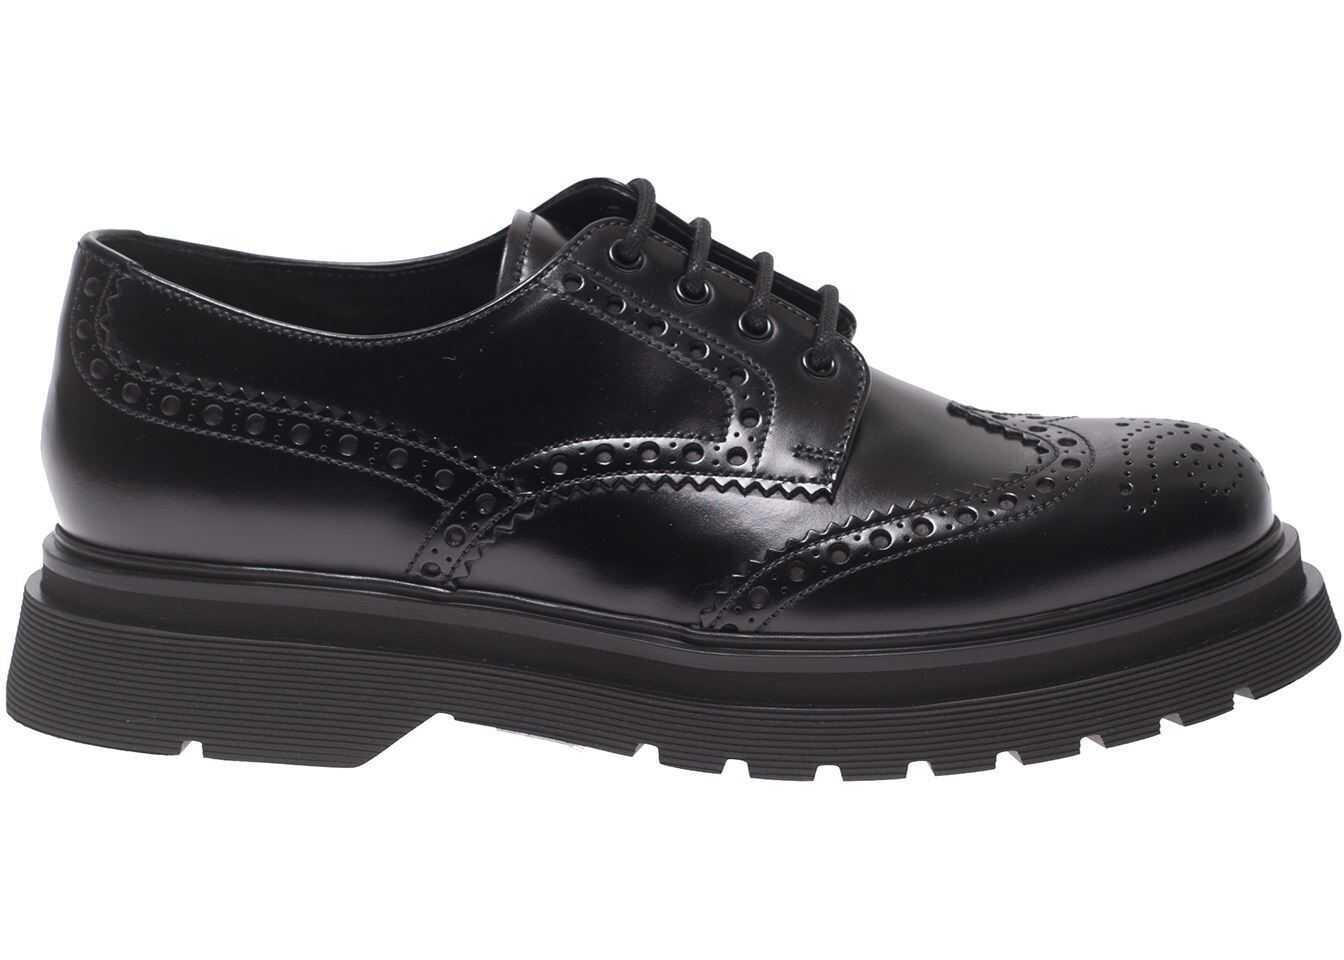 Prada Brogue Derby Shoes In Black 2EE347 B4L F0002 Black imagine b-mall.ro